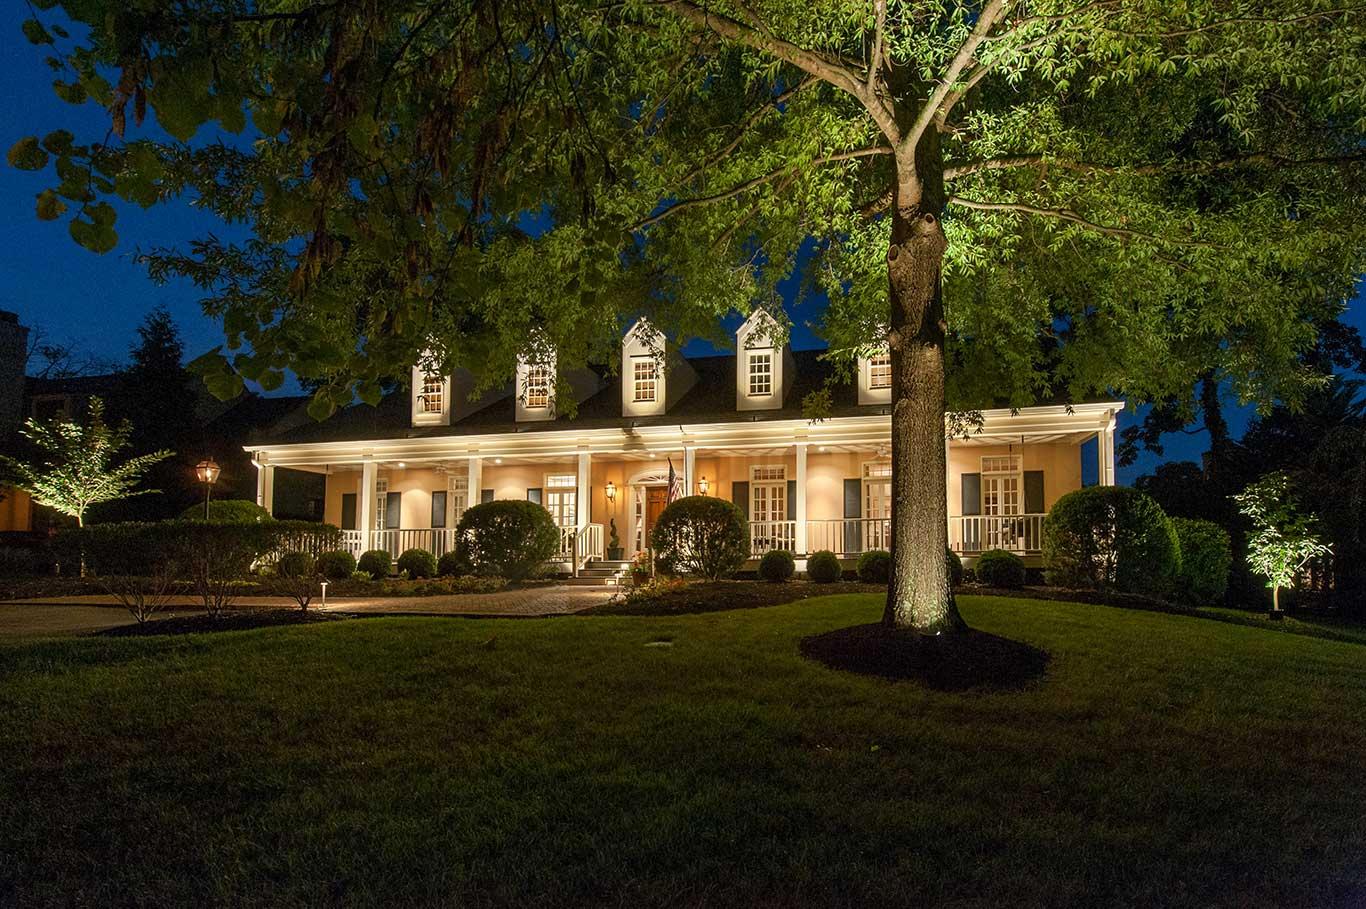 outdoor house lighting service in Nashville